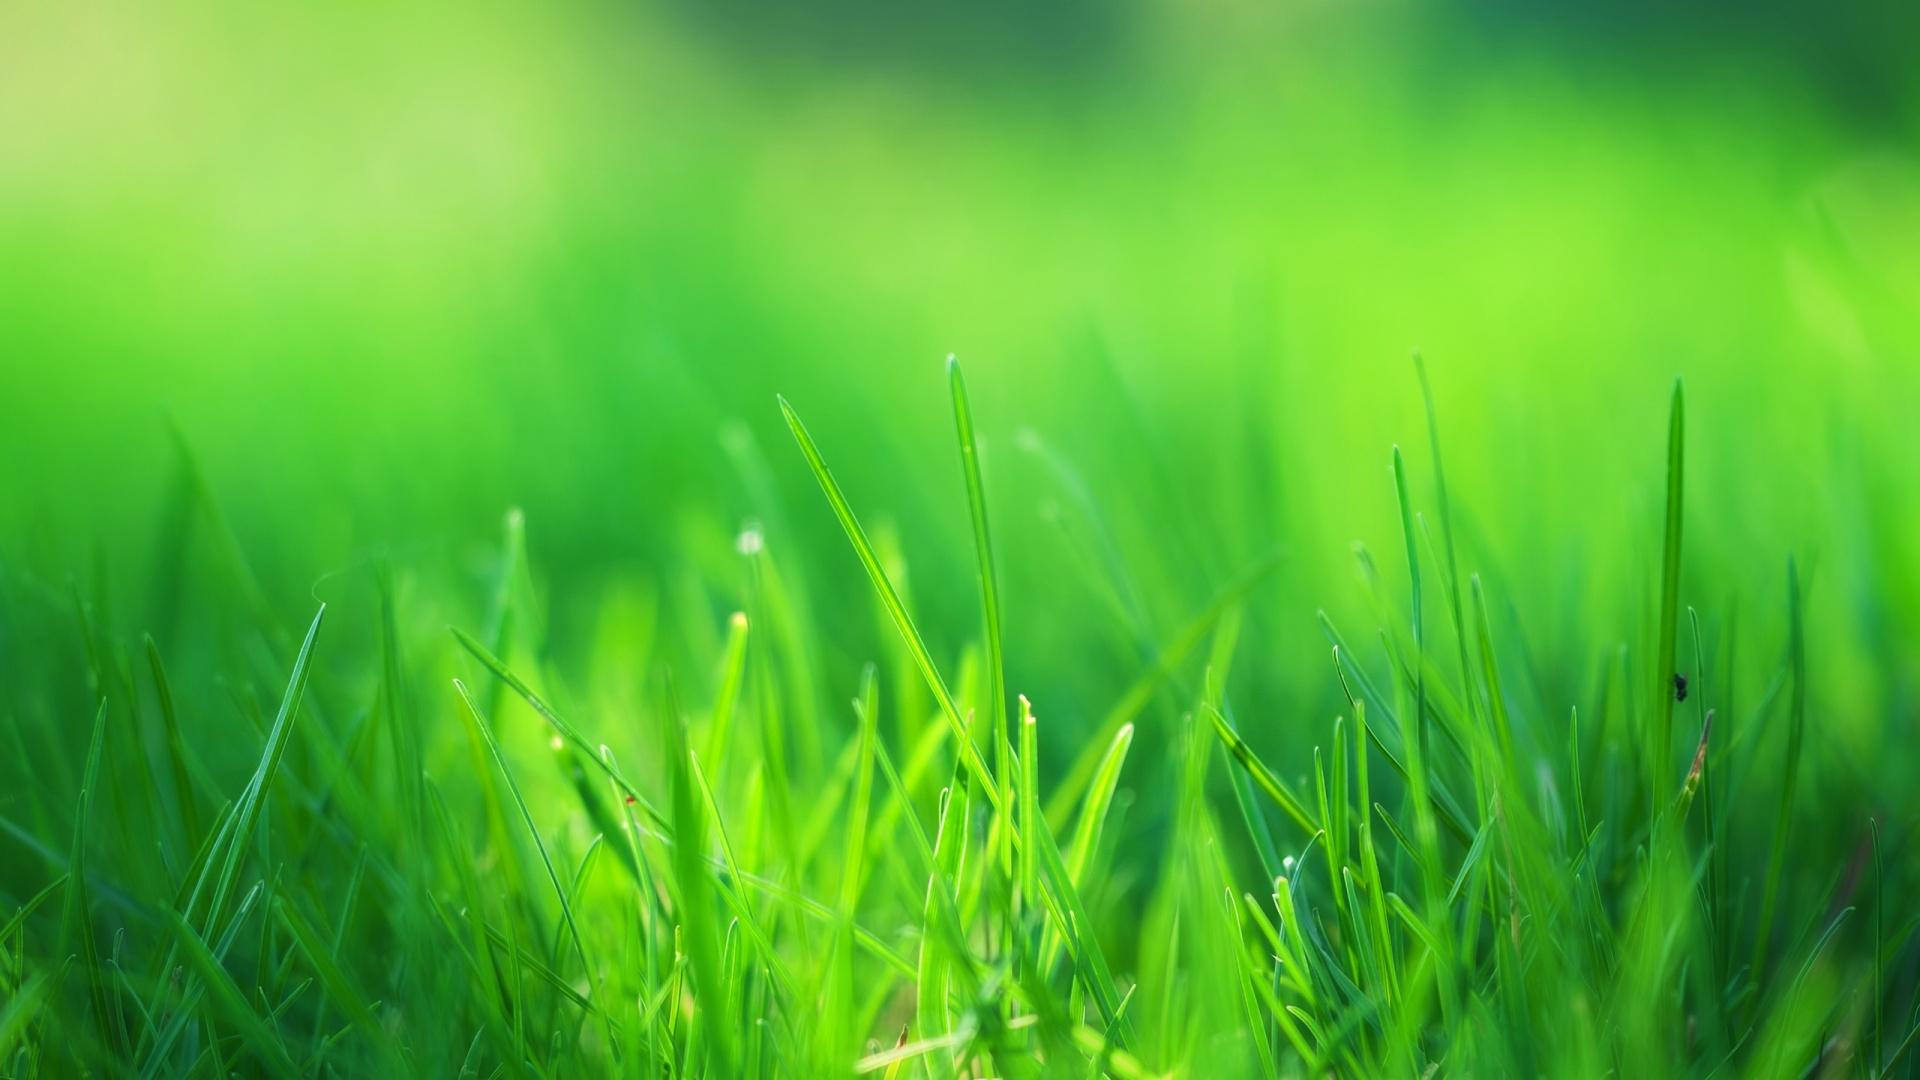 5735725_148841397983__downloadfiles_wallpapers_1920_1080_green_grass_field_.jpg